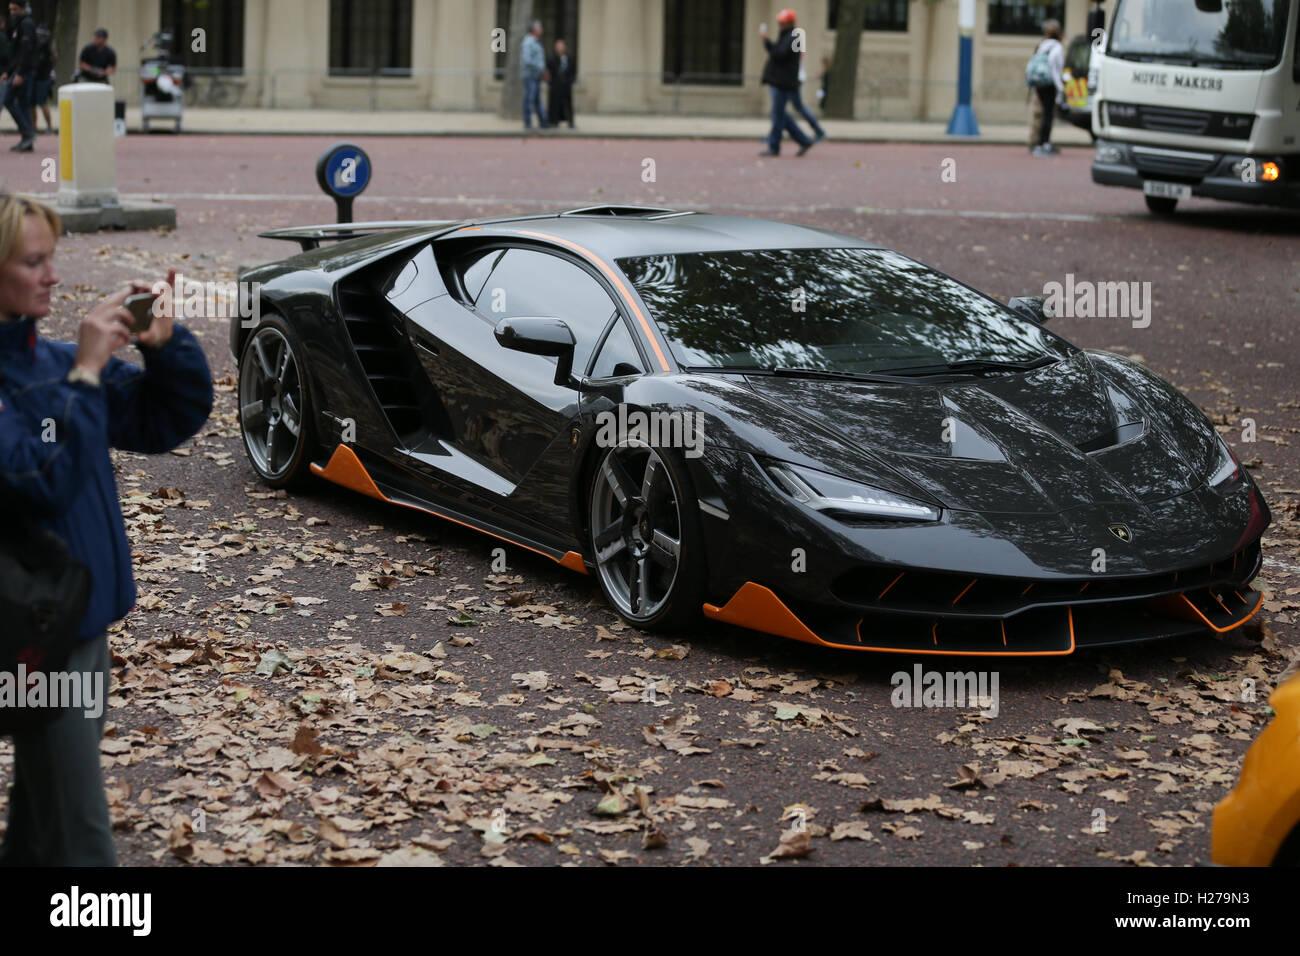 A Lamborghini Centenario Sports Car During Filming Of The Film Stock